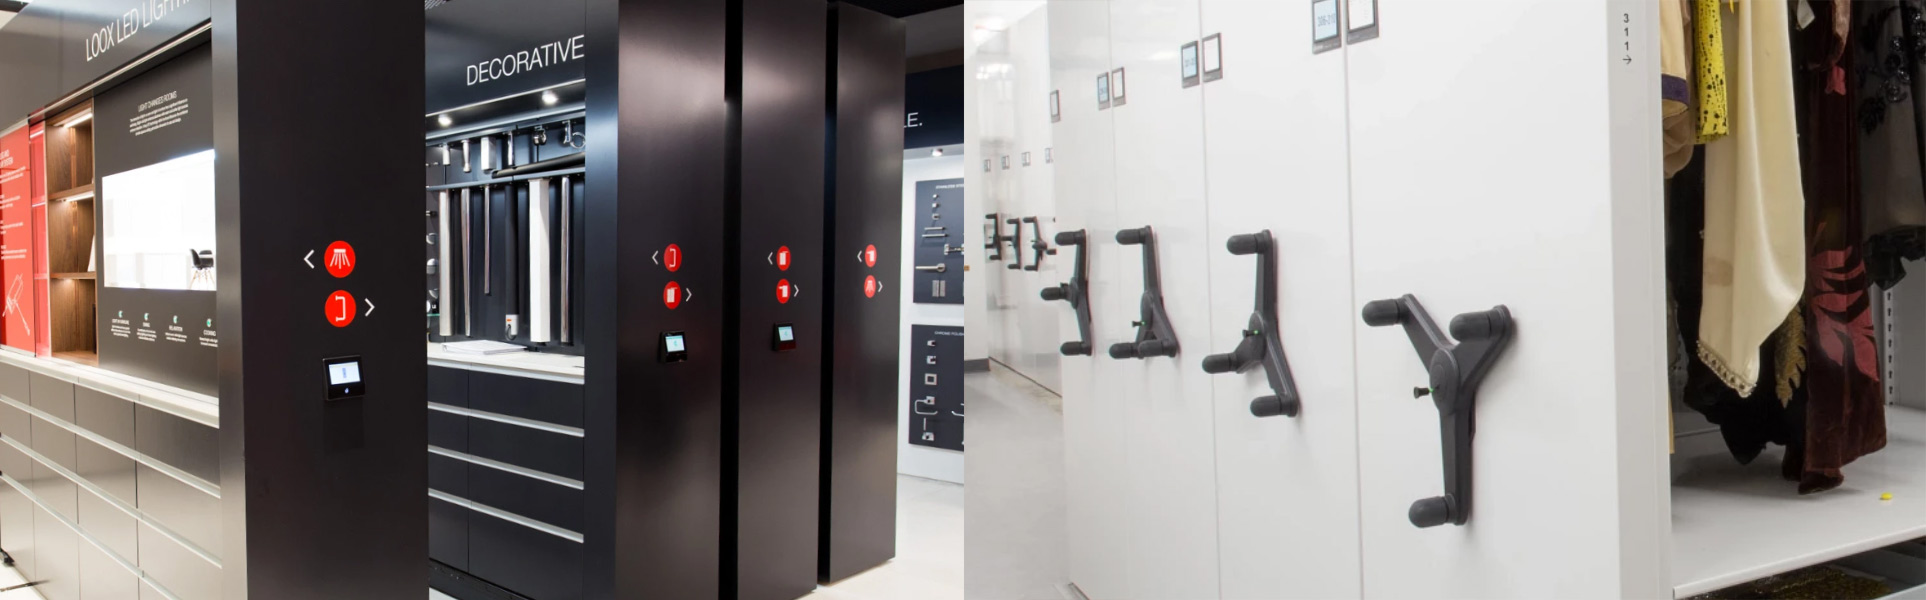 spacesaver electric vs mechanical mobile shelves